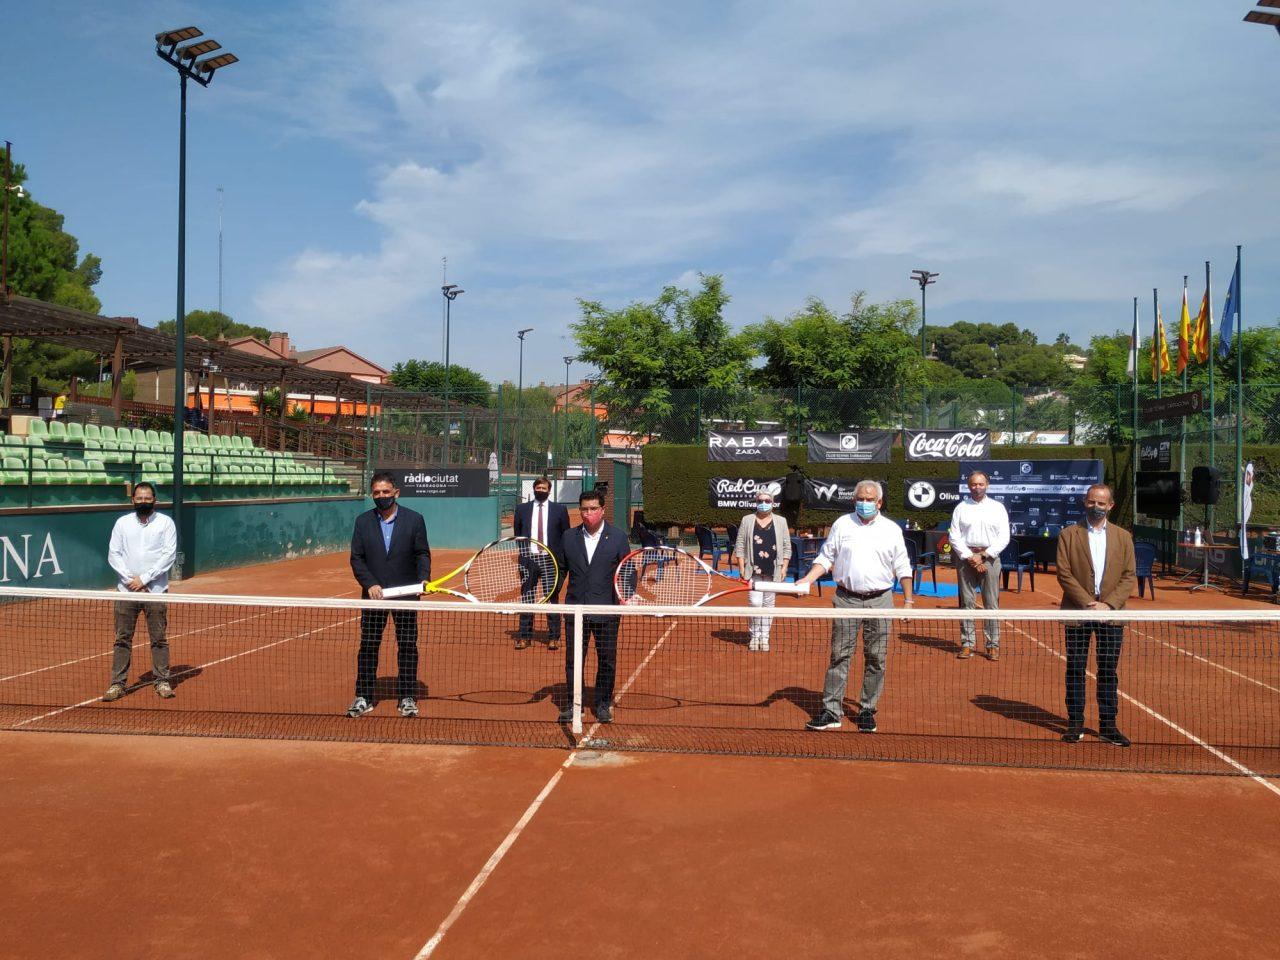 Tennis-Park-1280x960.jpg